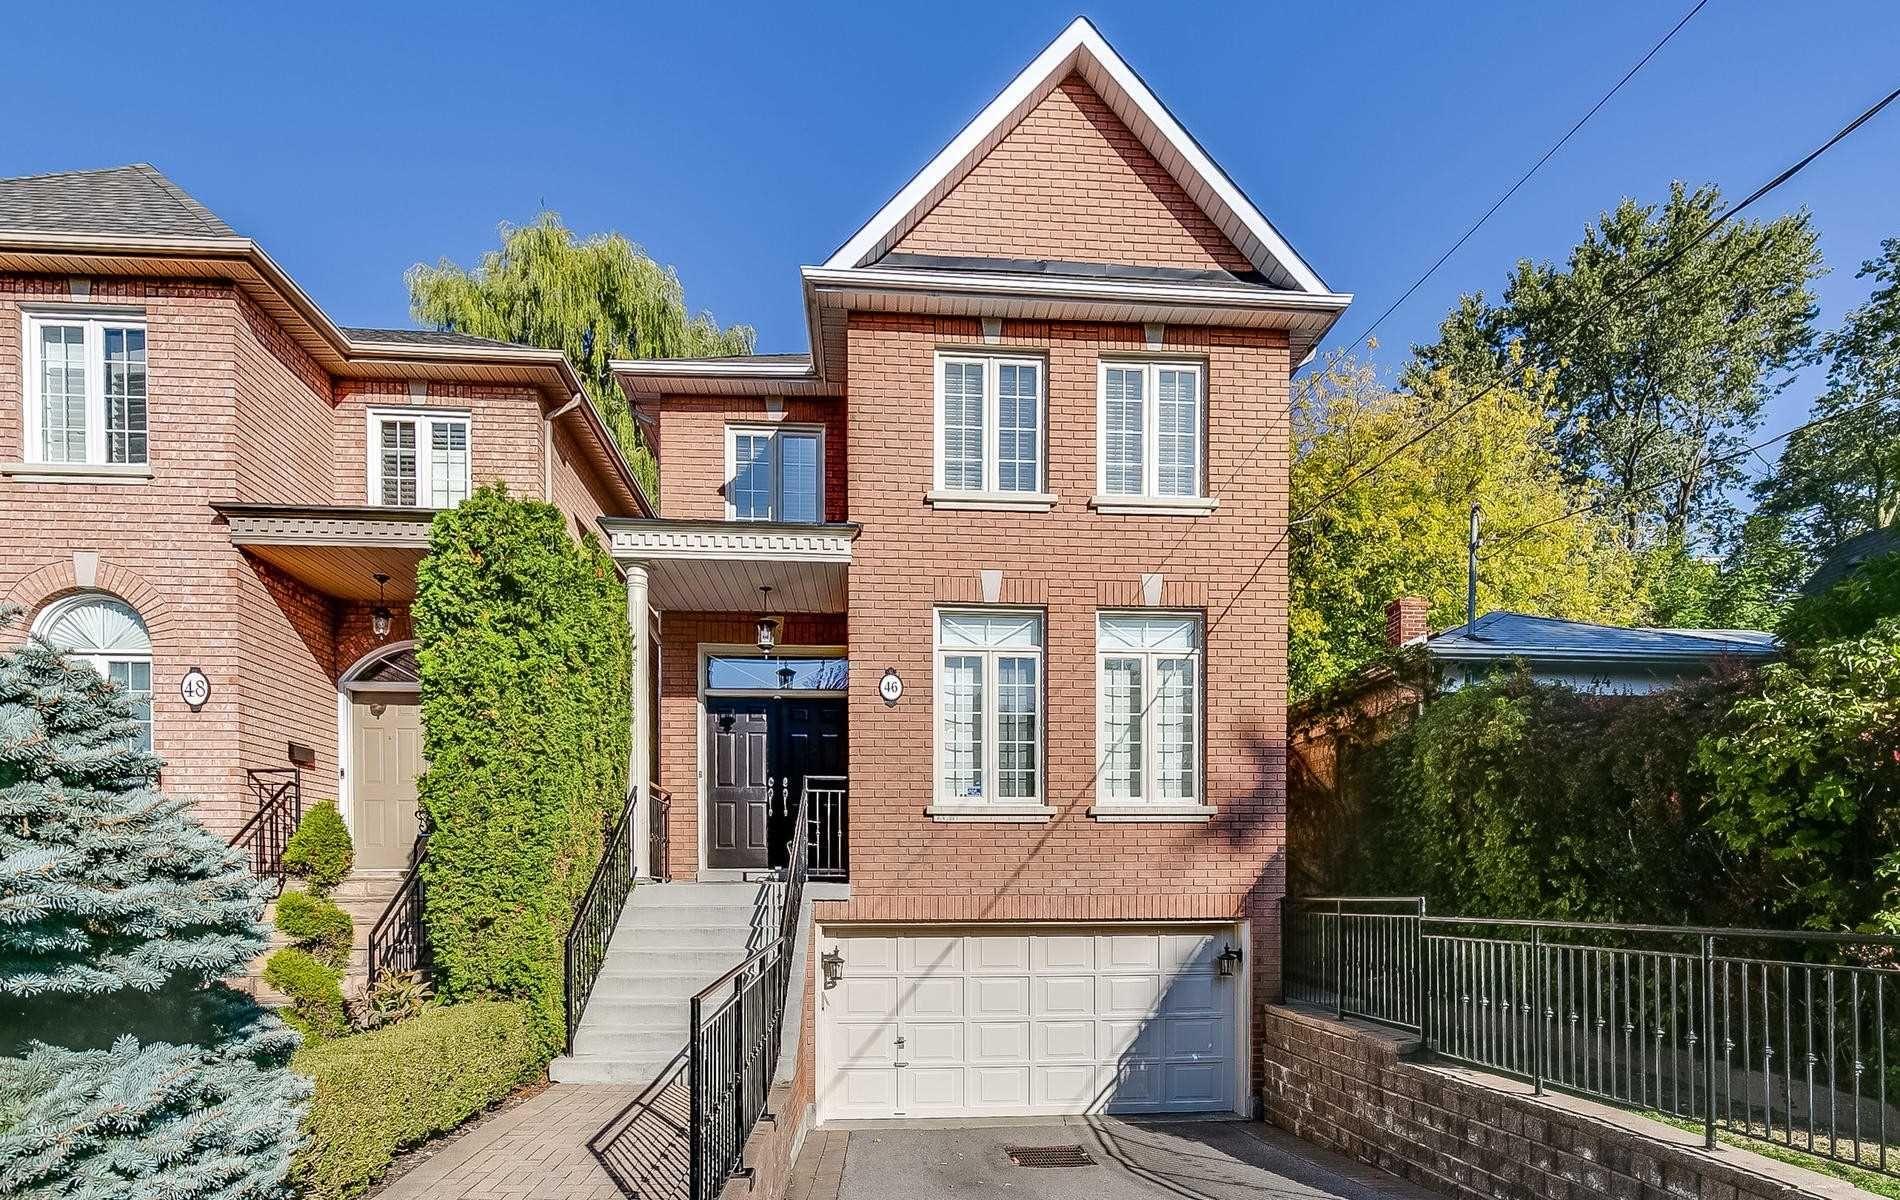 Main Photo: 46 Cameron Avenue in Toronto: Lansing-Westgate House (2-Storey) for sale (Toronto C07)  : MLS®# C4610322